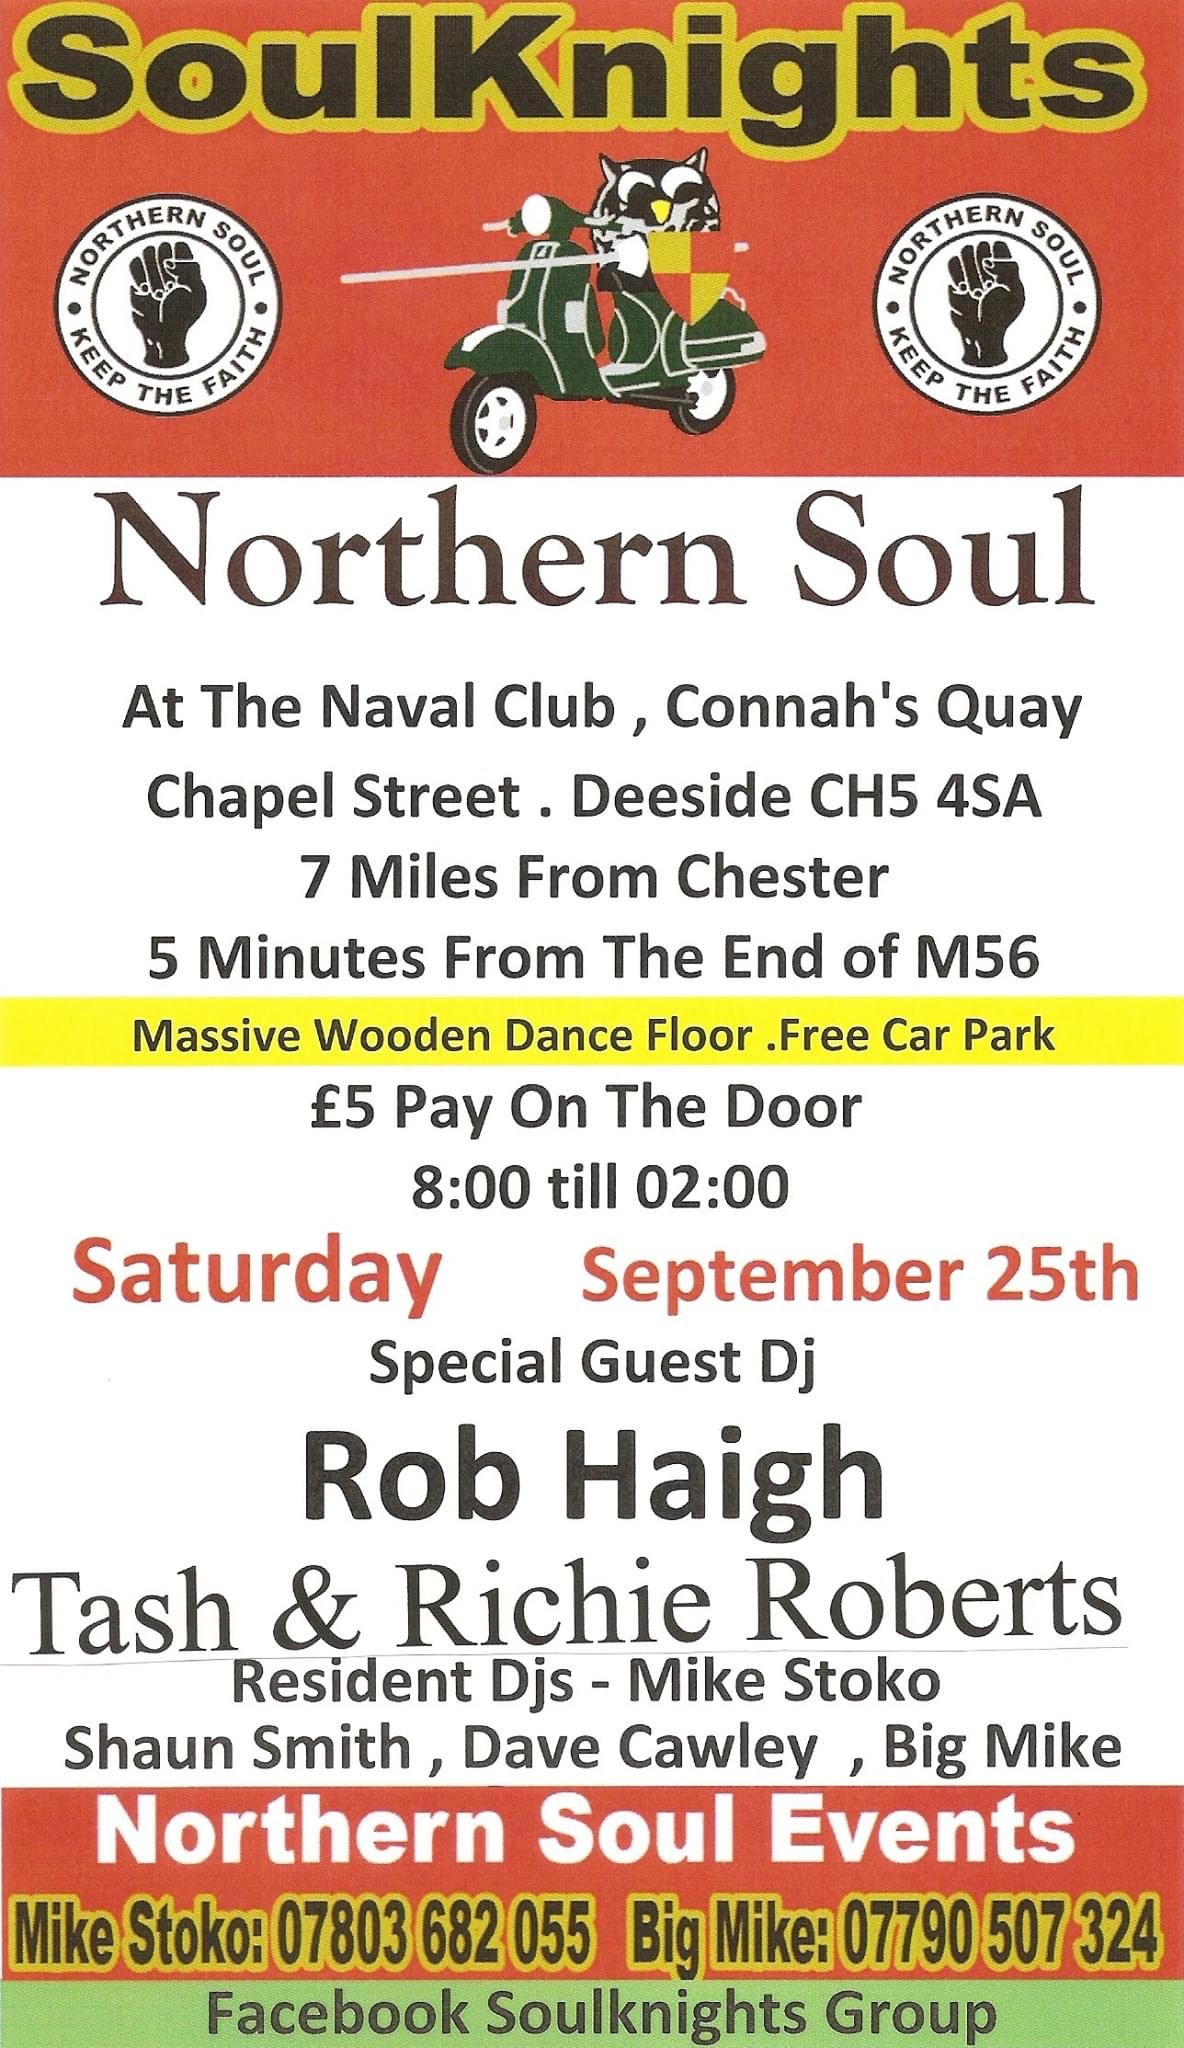 Soulknights Guests Rob Haigh Tash  Richie Roberts flyer